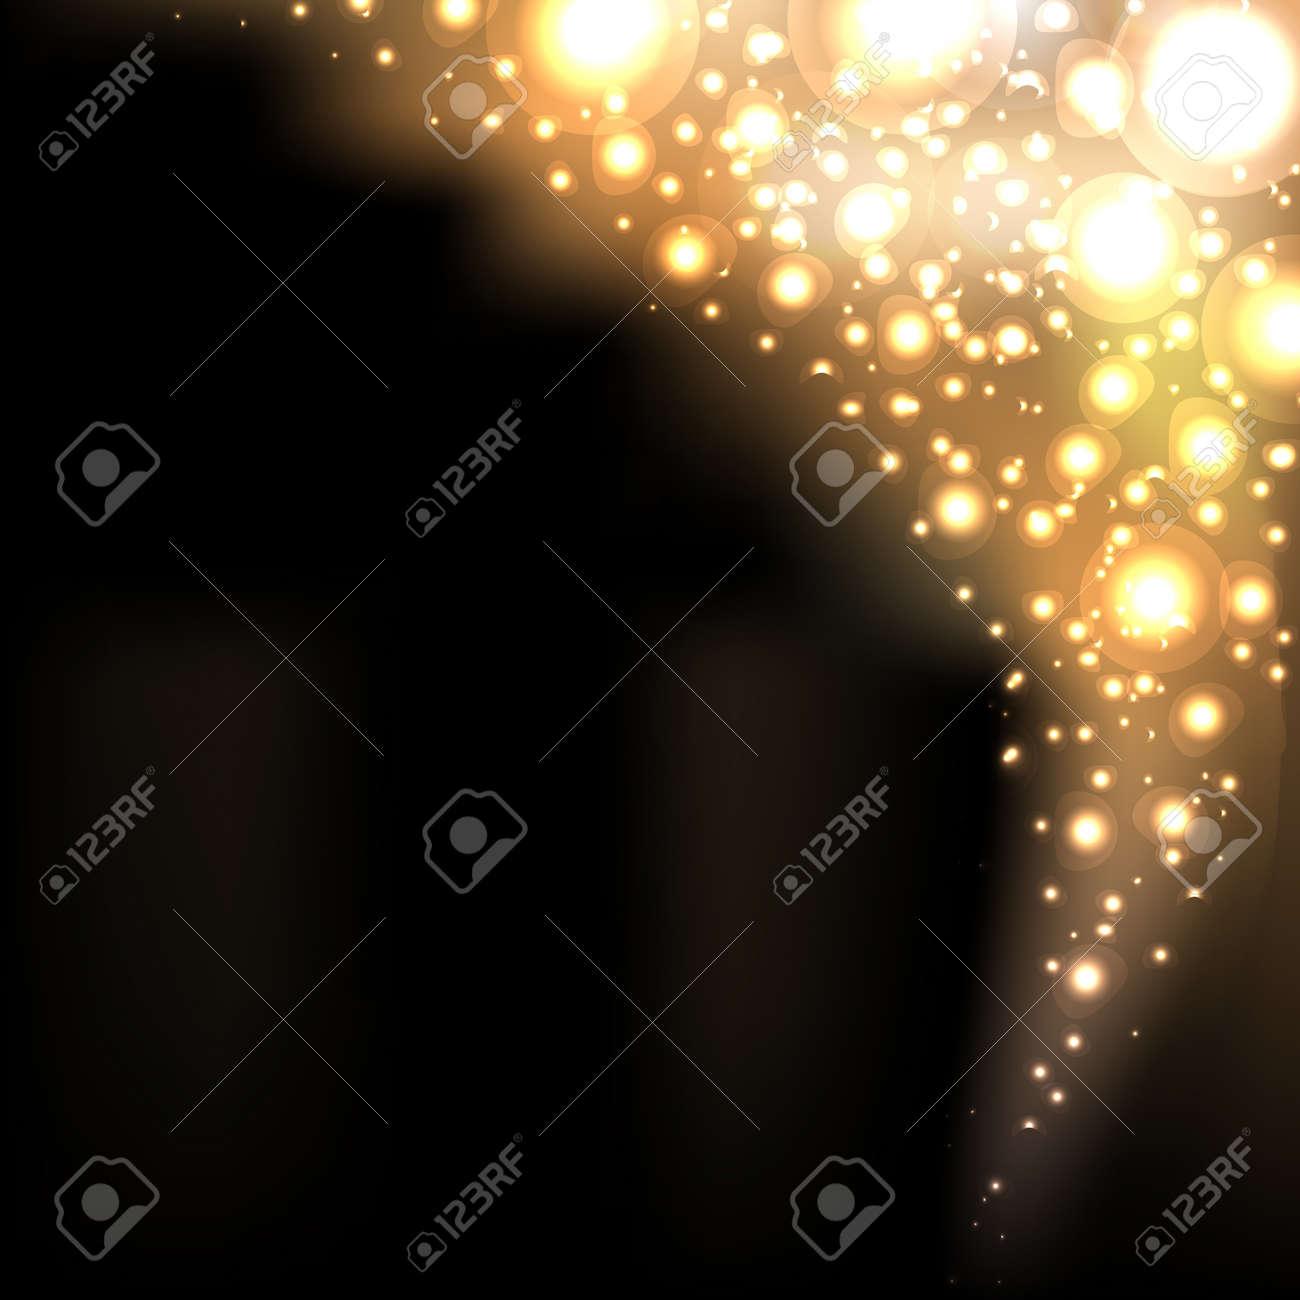 Gold Abstract Dark Elegant Background Stock Vector - 14230357